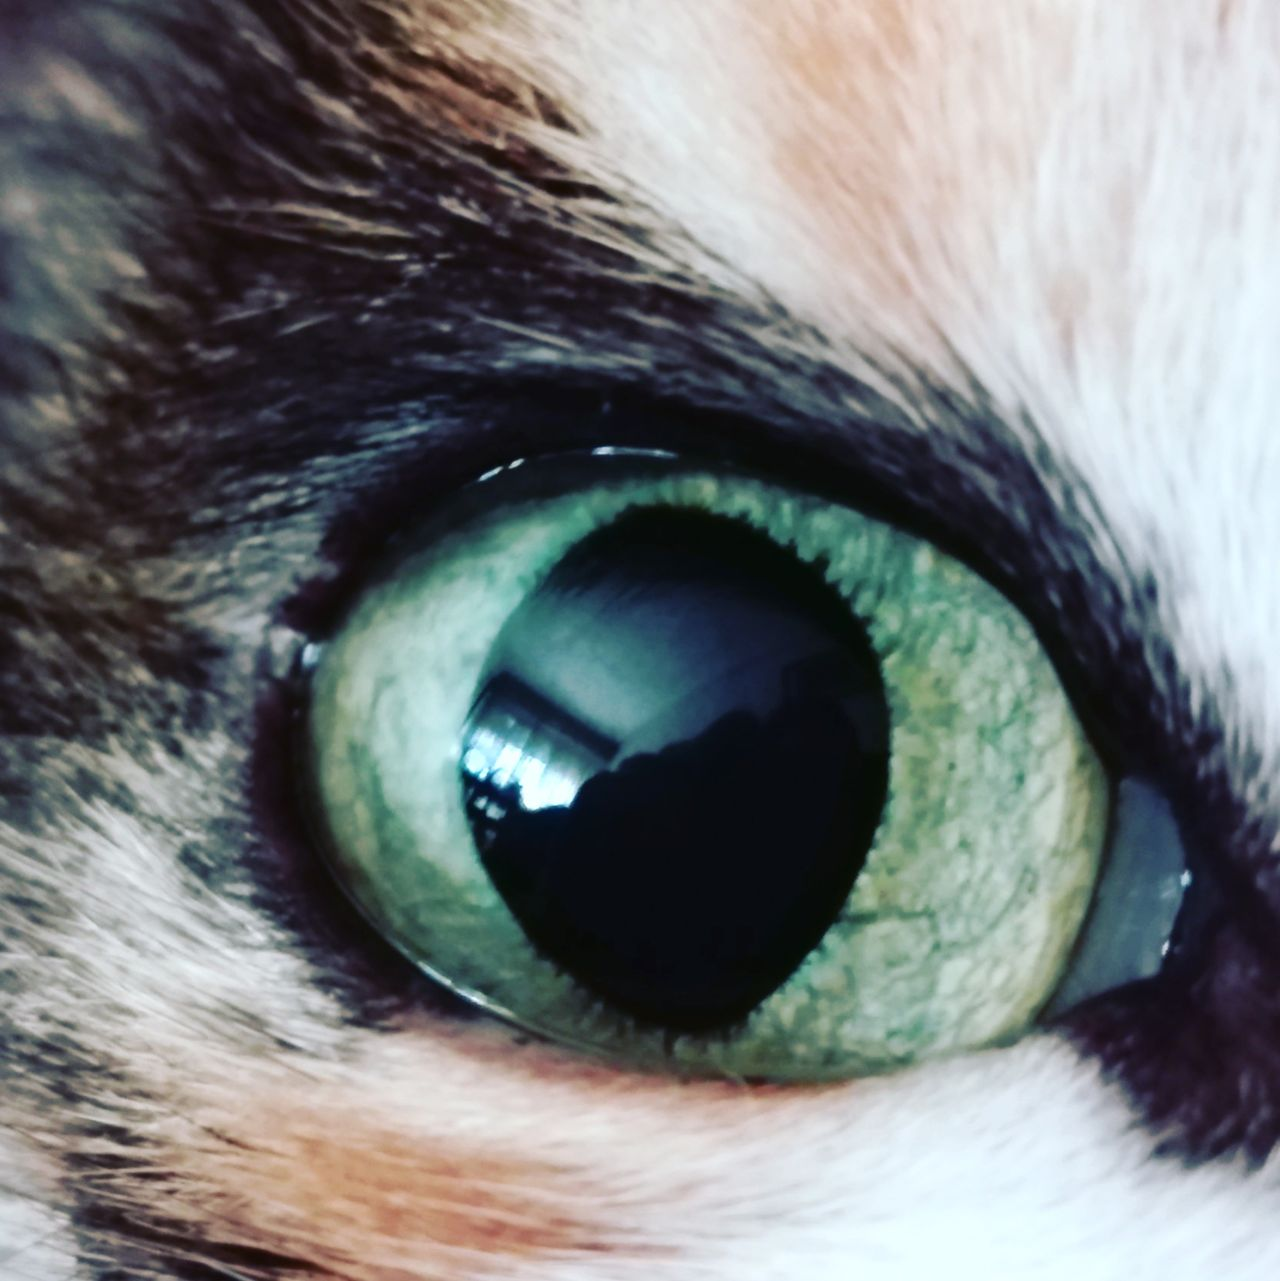 Sensory Perception Eyesight Full Frame Iris - Eye Eyelash Day Vision Cat Cateyes CatEye Cat Lovers Cat♡ Cats 🐱 Cats Of EyeEm Catoftheday Cat Watching Cat Photography Catlover